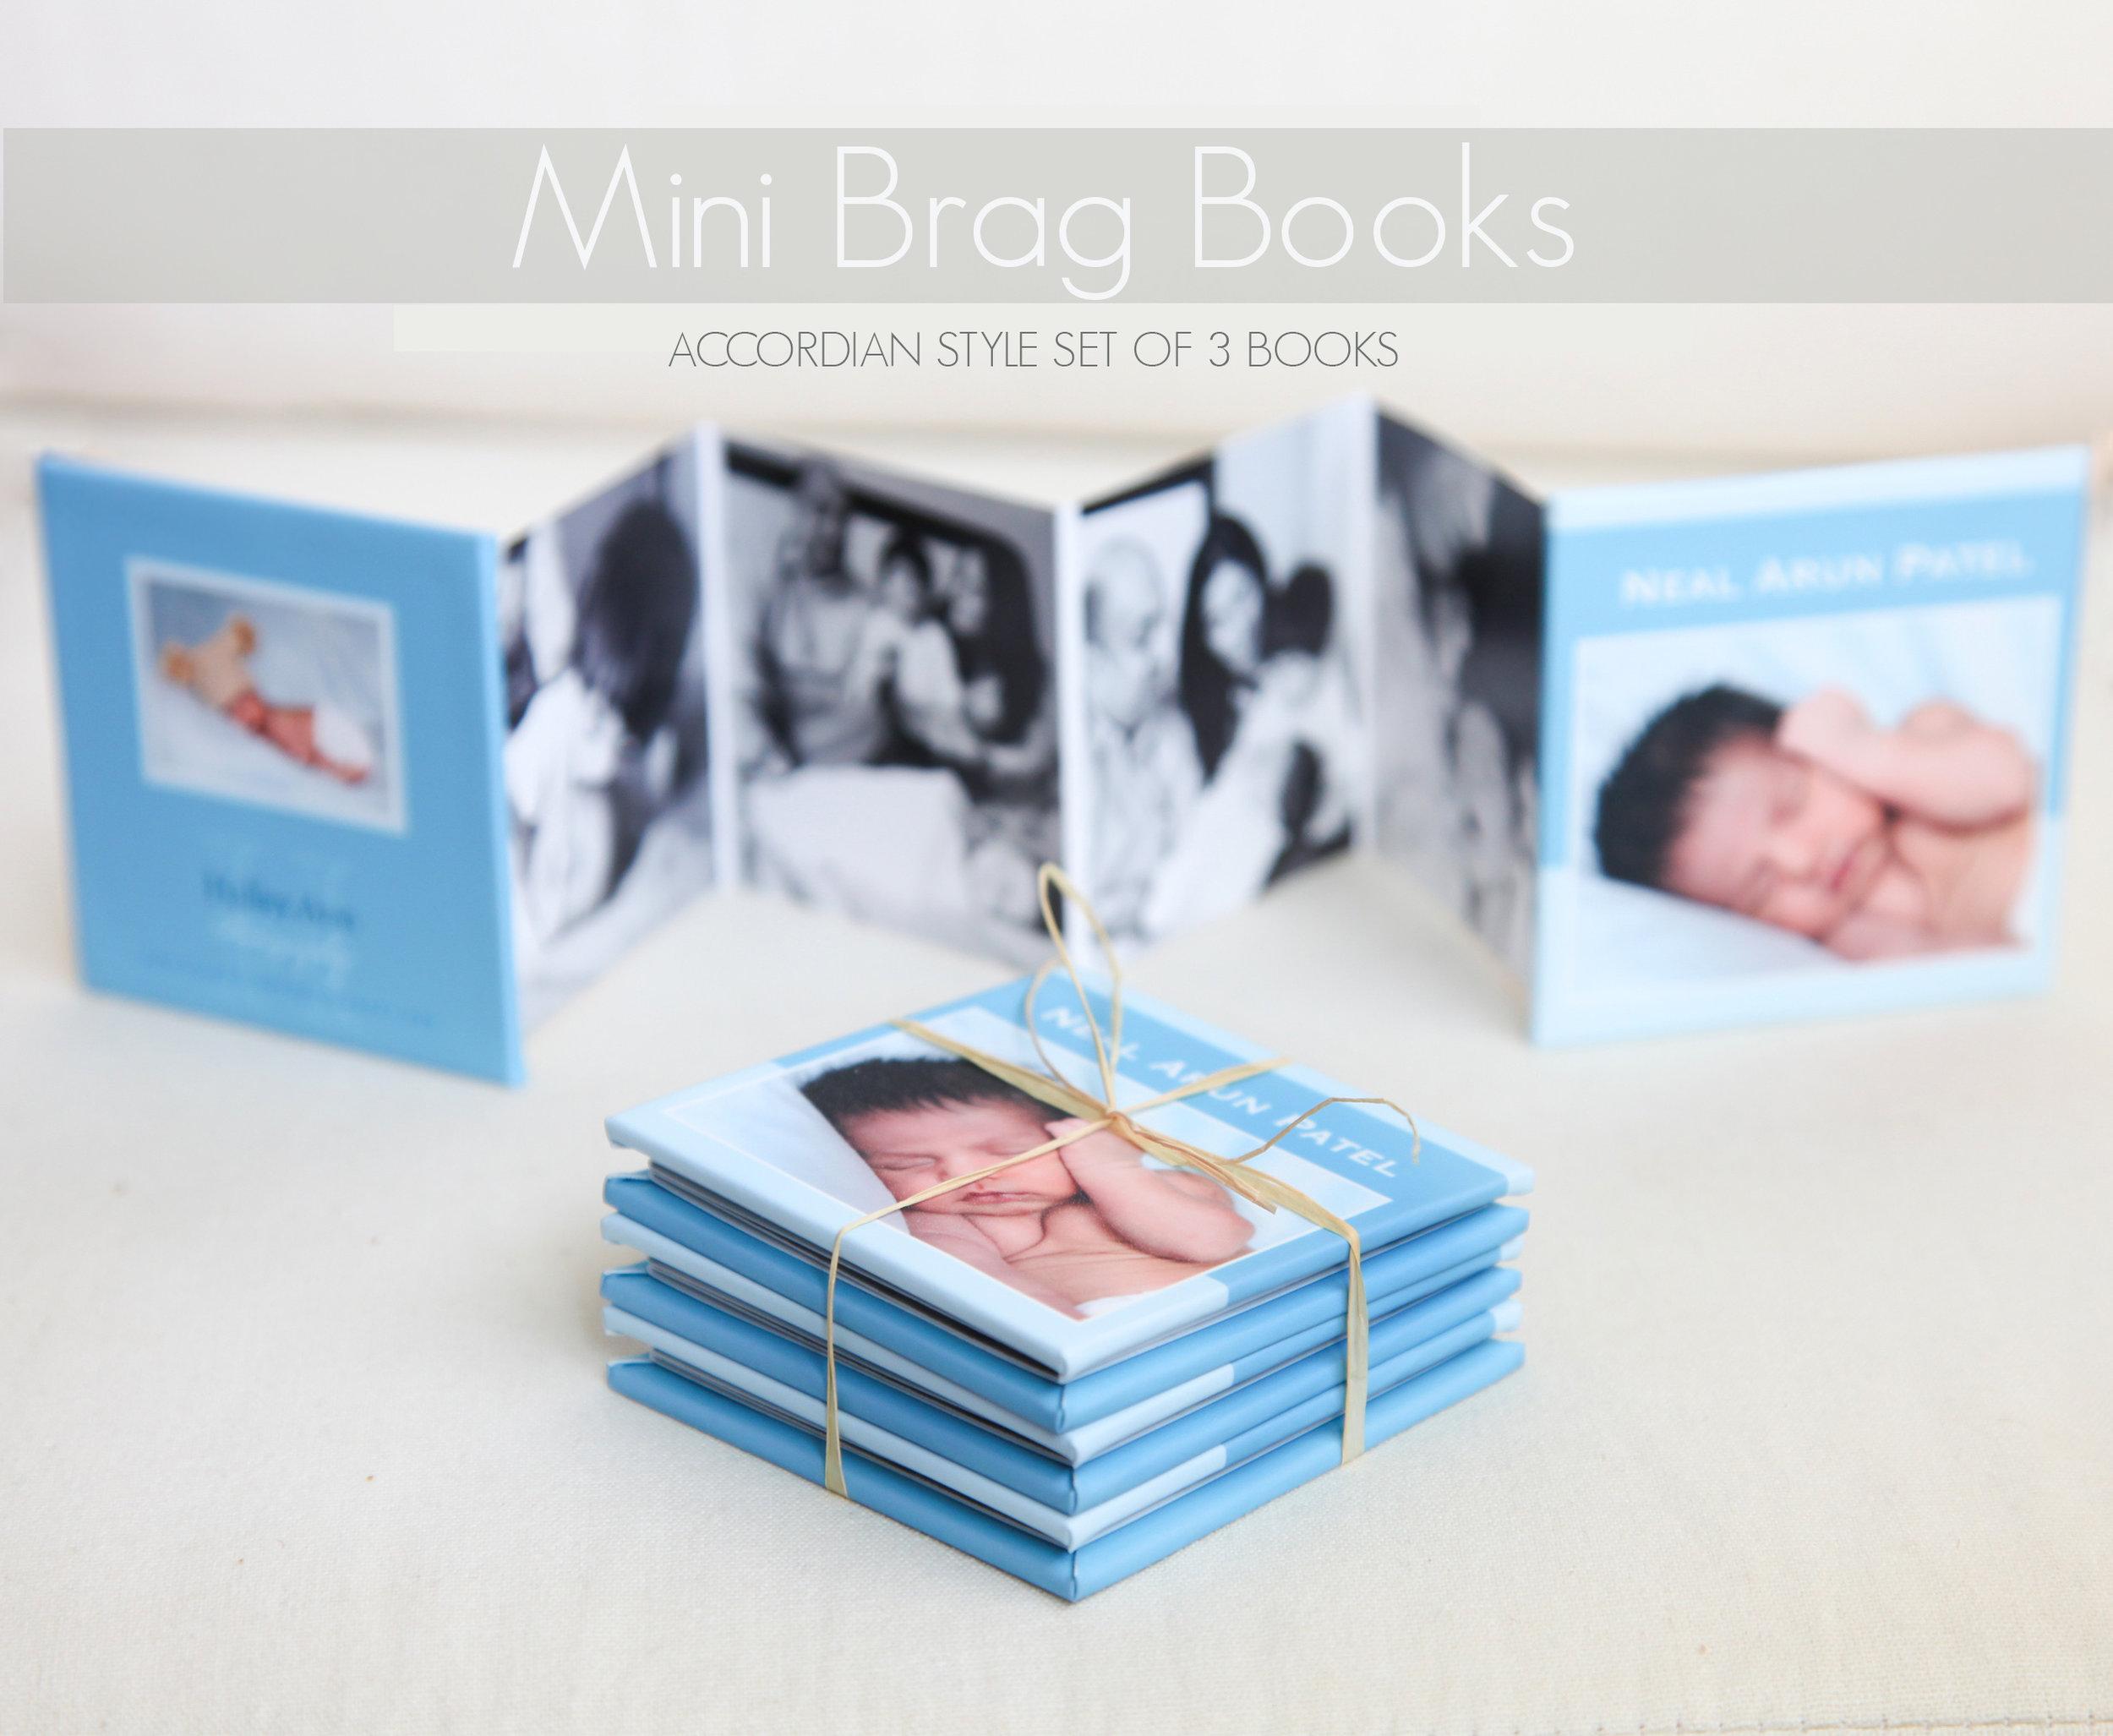 Mini Brag Book Advertising.jpg